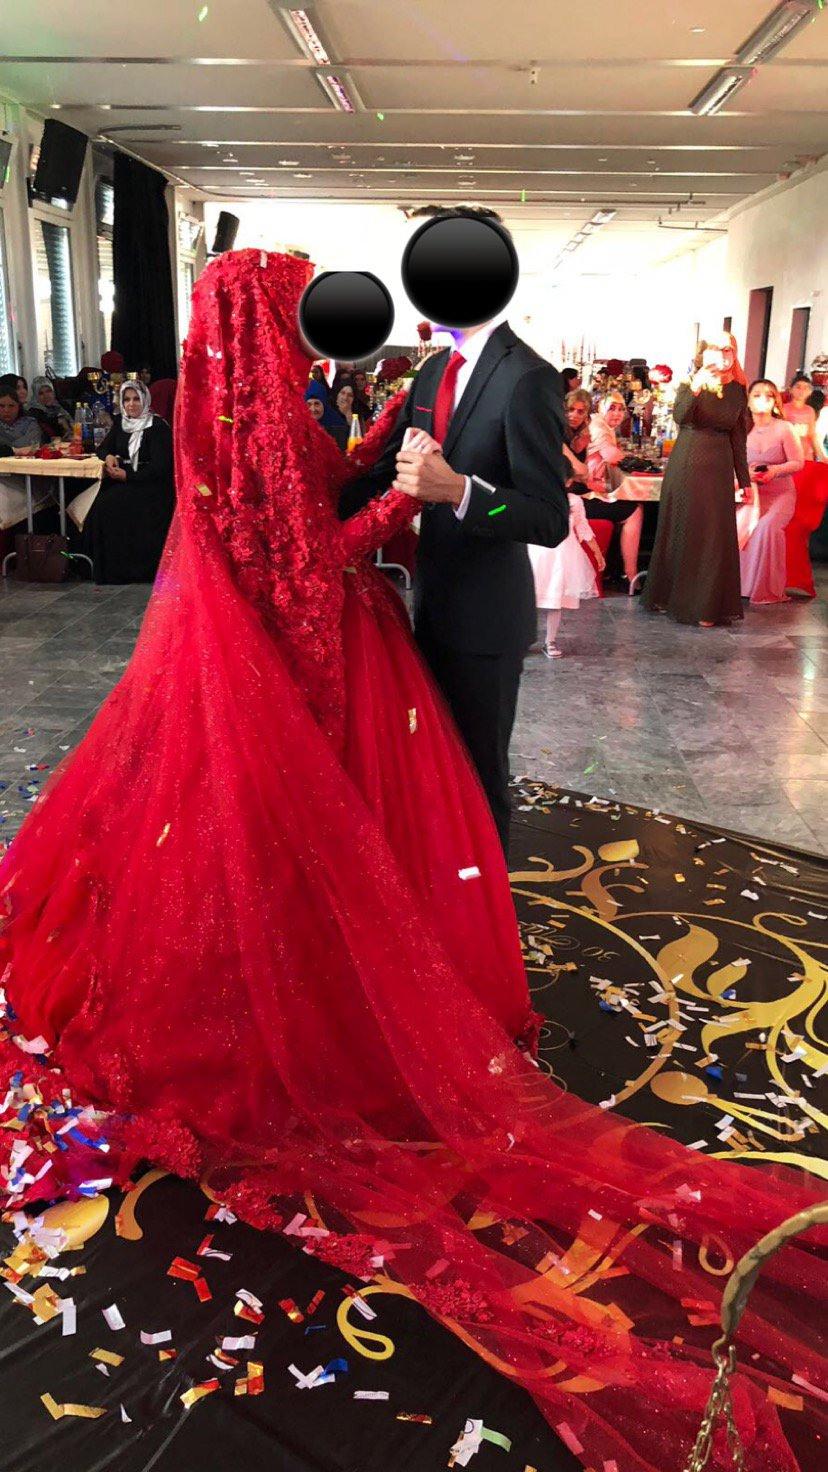 Formal Cool Henna Abend Rotes Kleid Spezialgebiet15 Genial Henna Abend Rotes Kleid Boutique